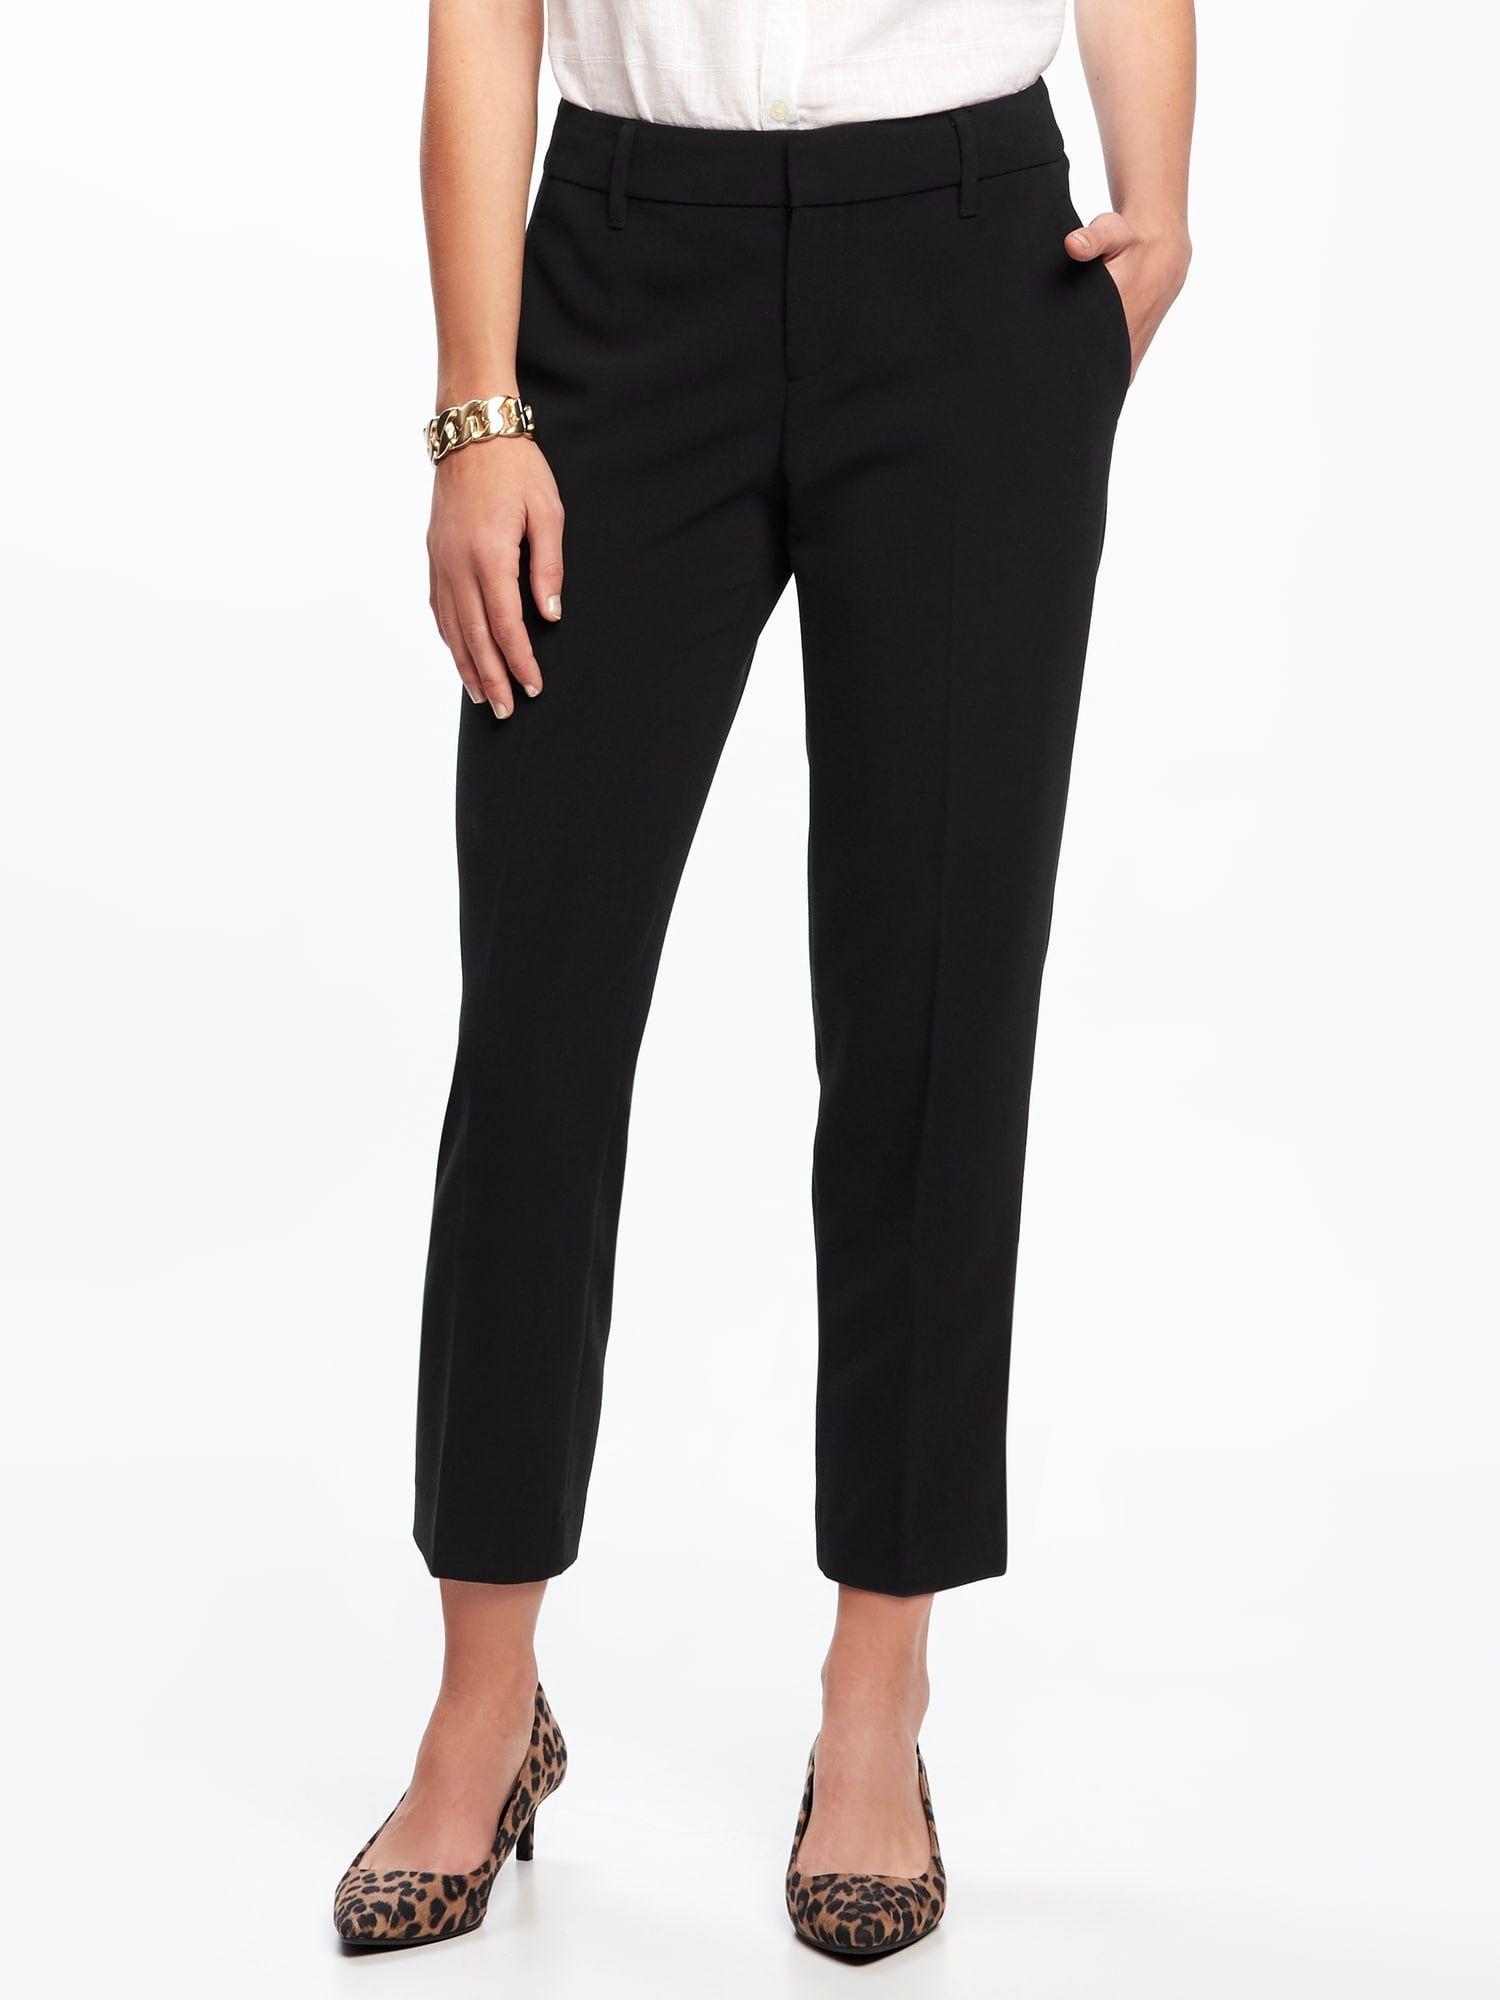 3c10ee935b3 Old Navy Dress Pants For Ladies - Gomes Weine AG